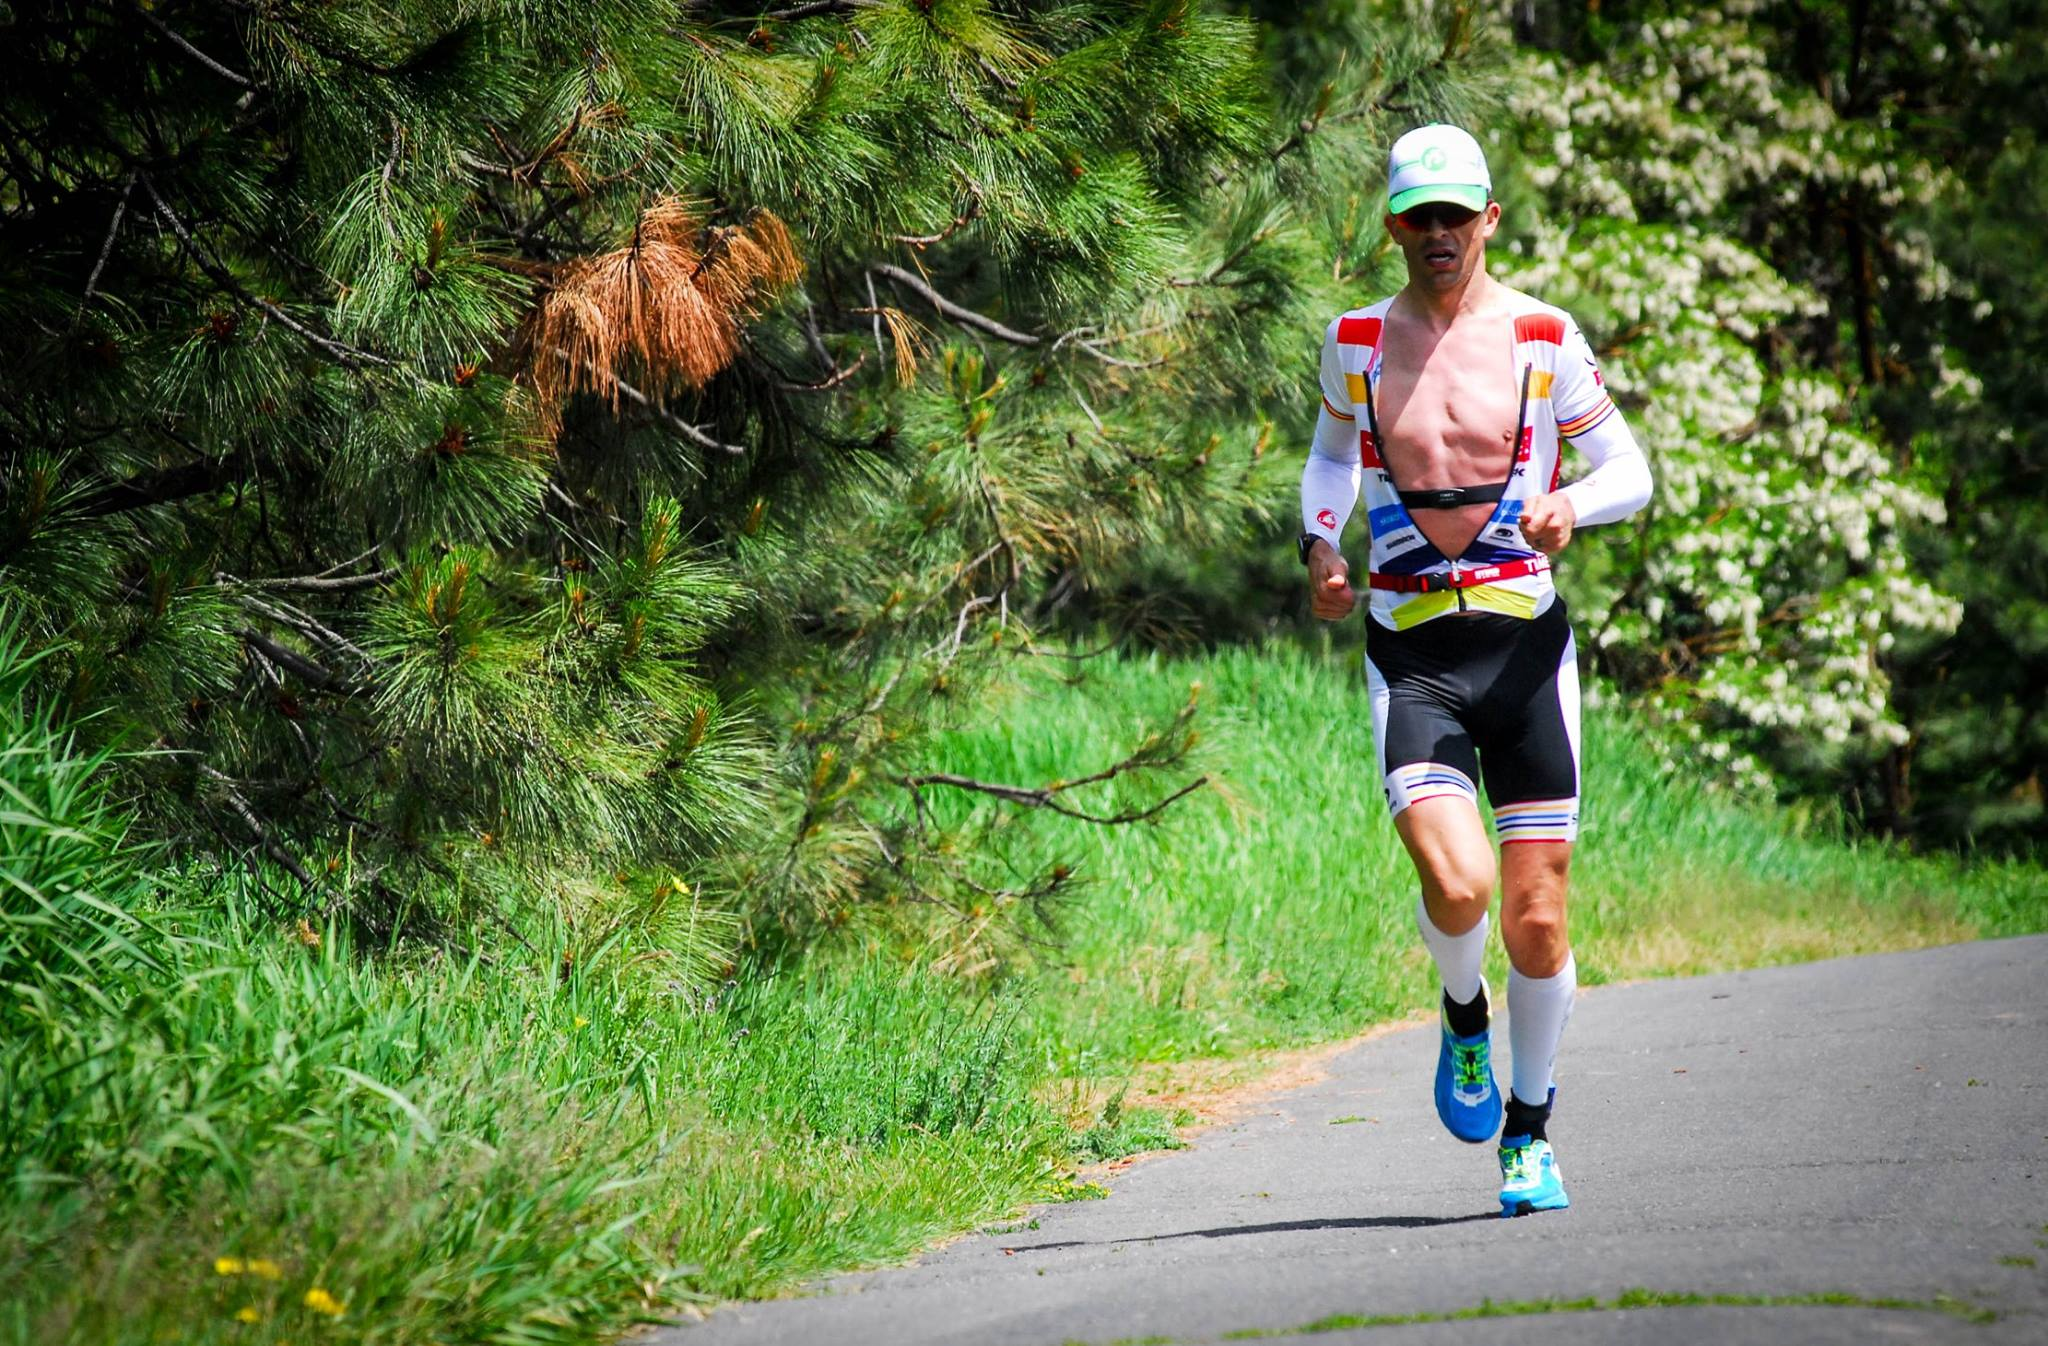 Roger Thompson on the run - Photo by Craig Thorsen